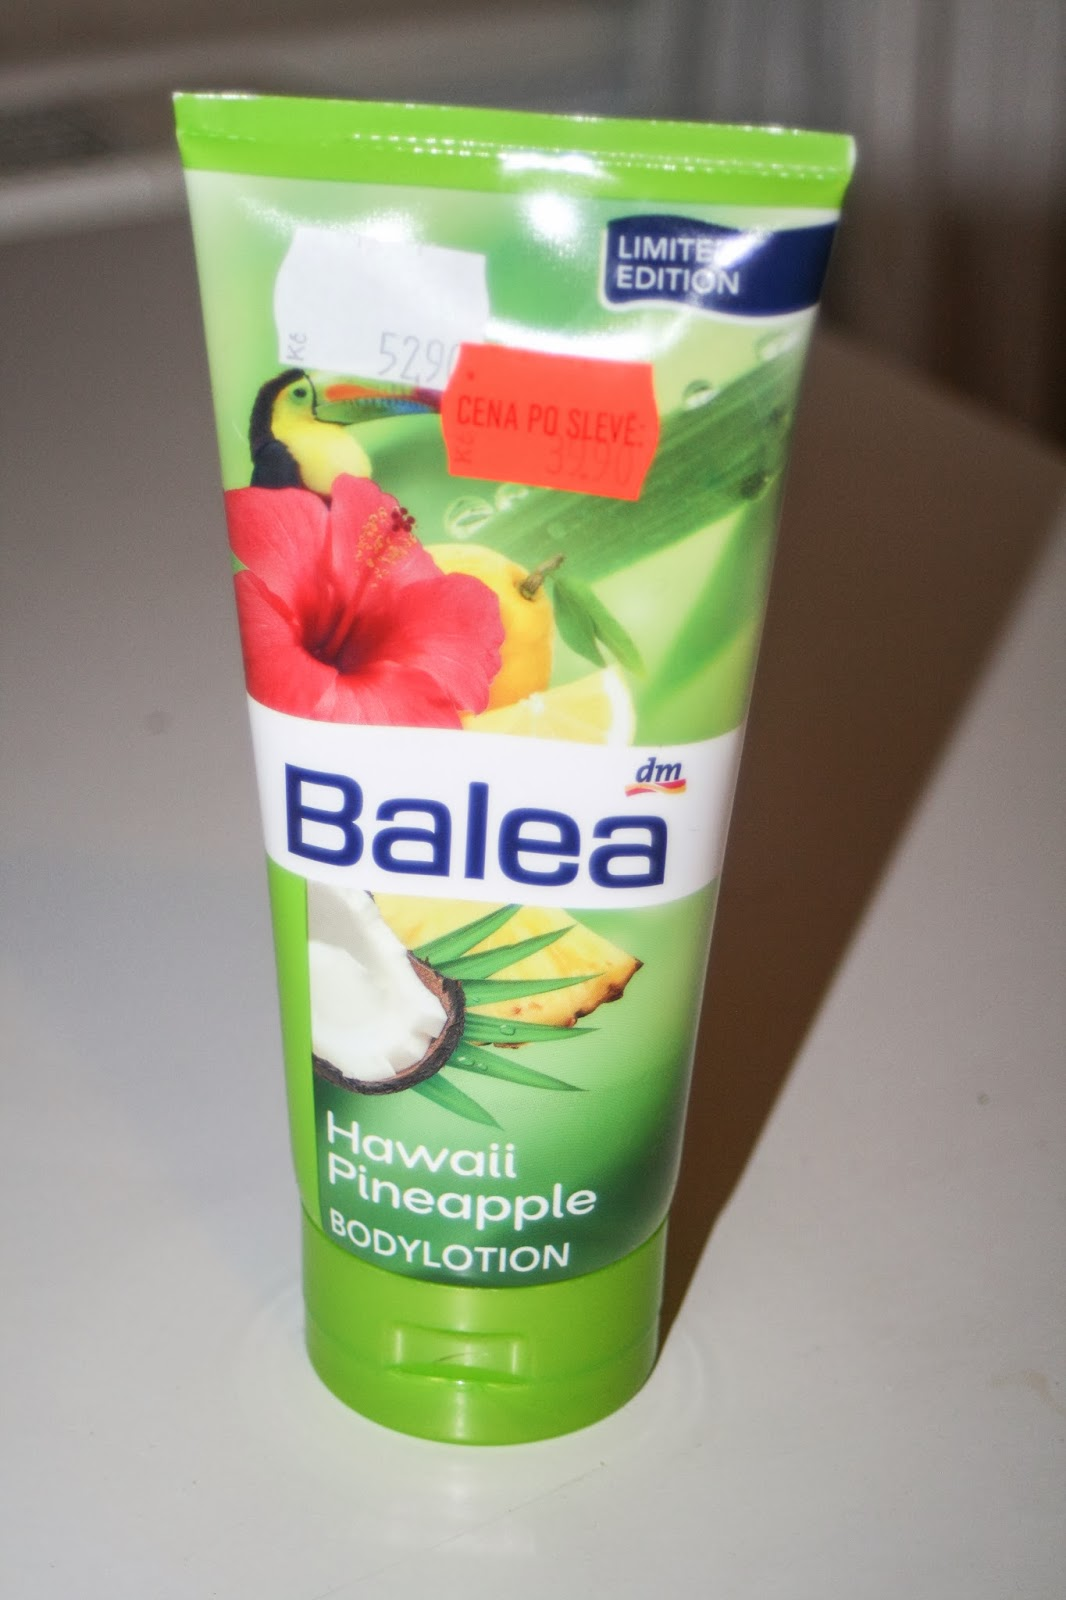 balea, body